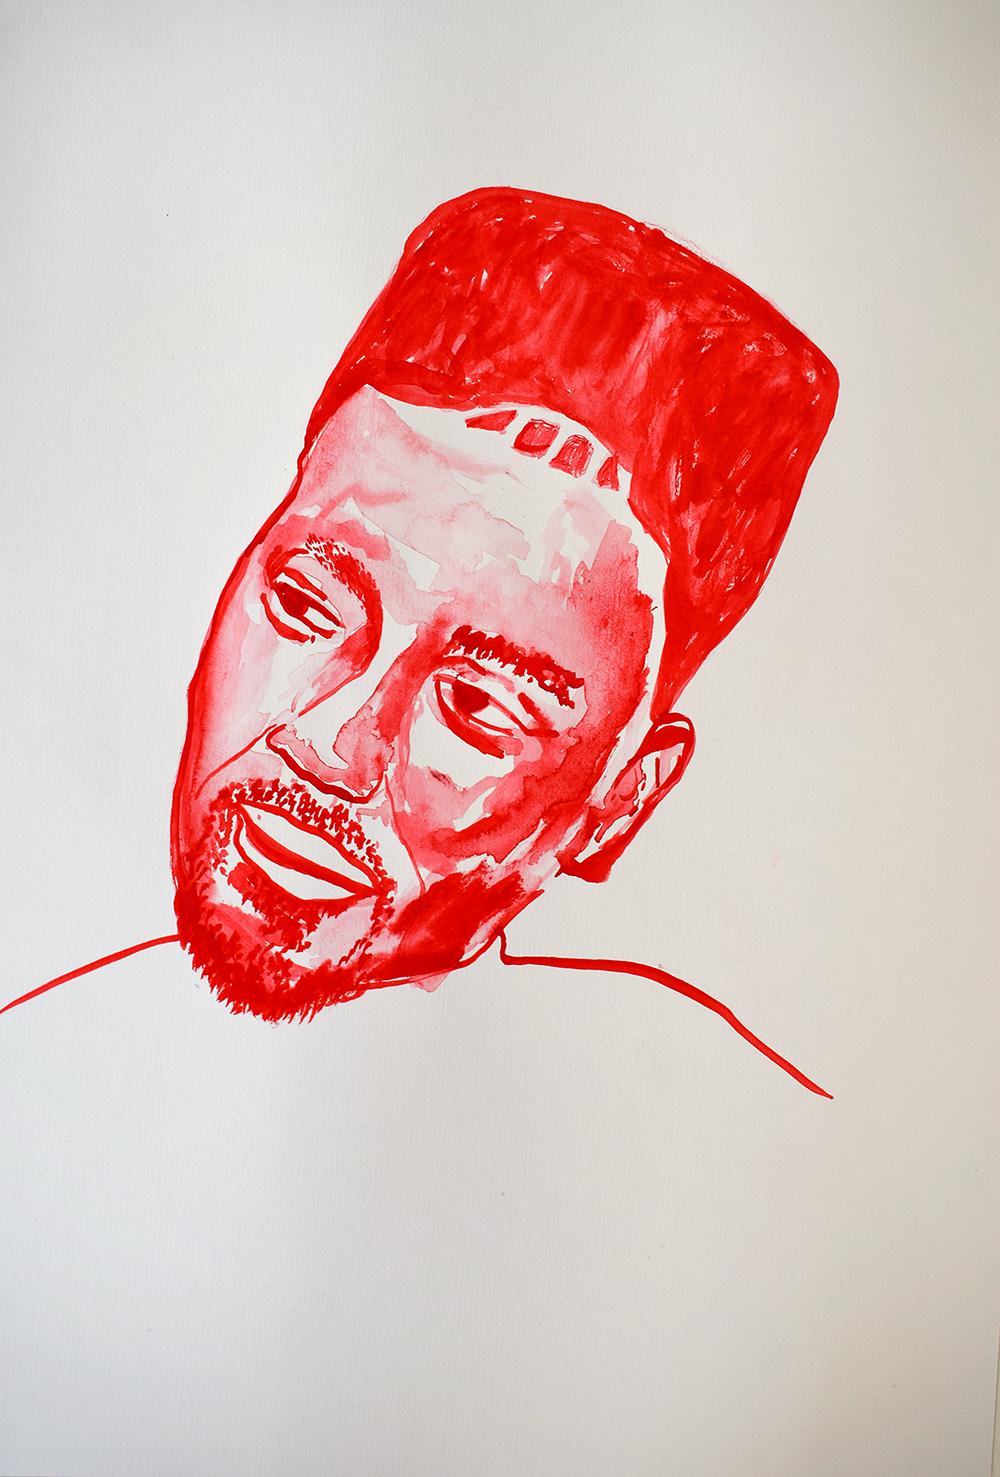 Big Daddy Kane by ali-tareen hiphop art 720.jpg